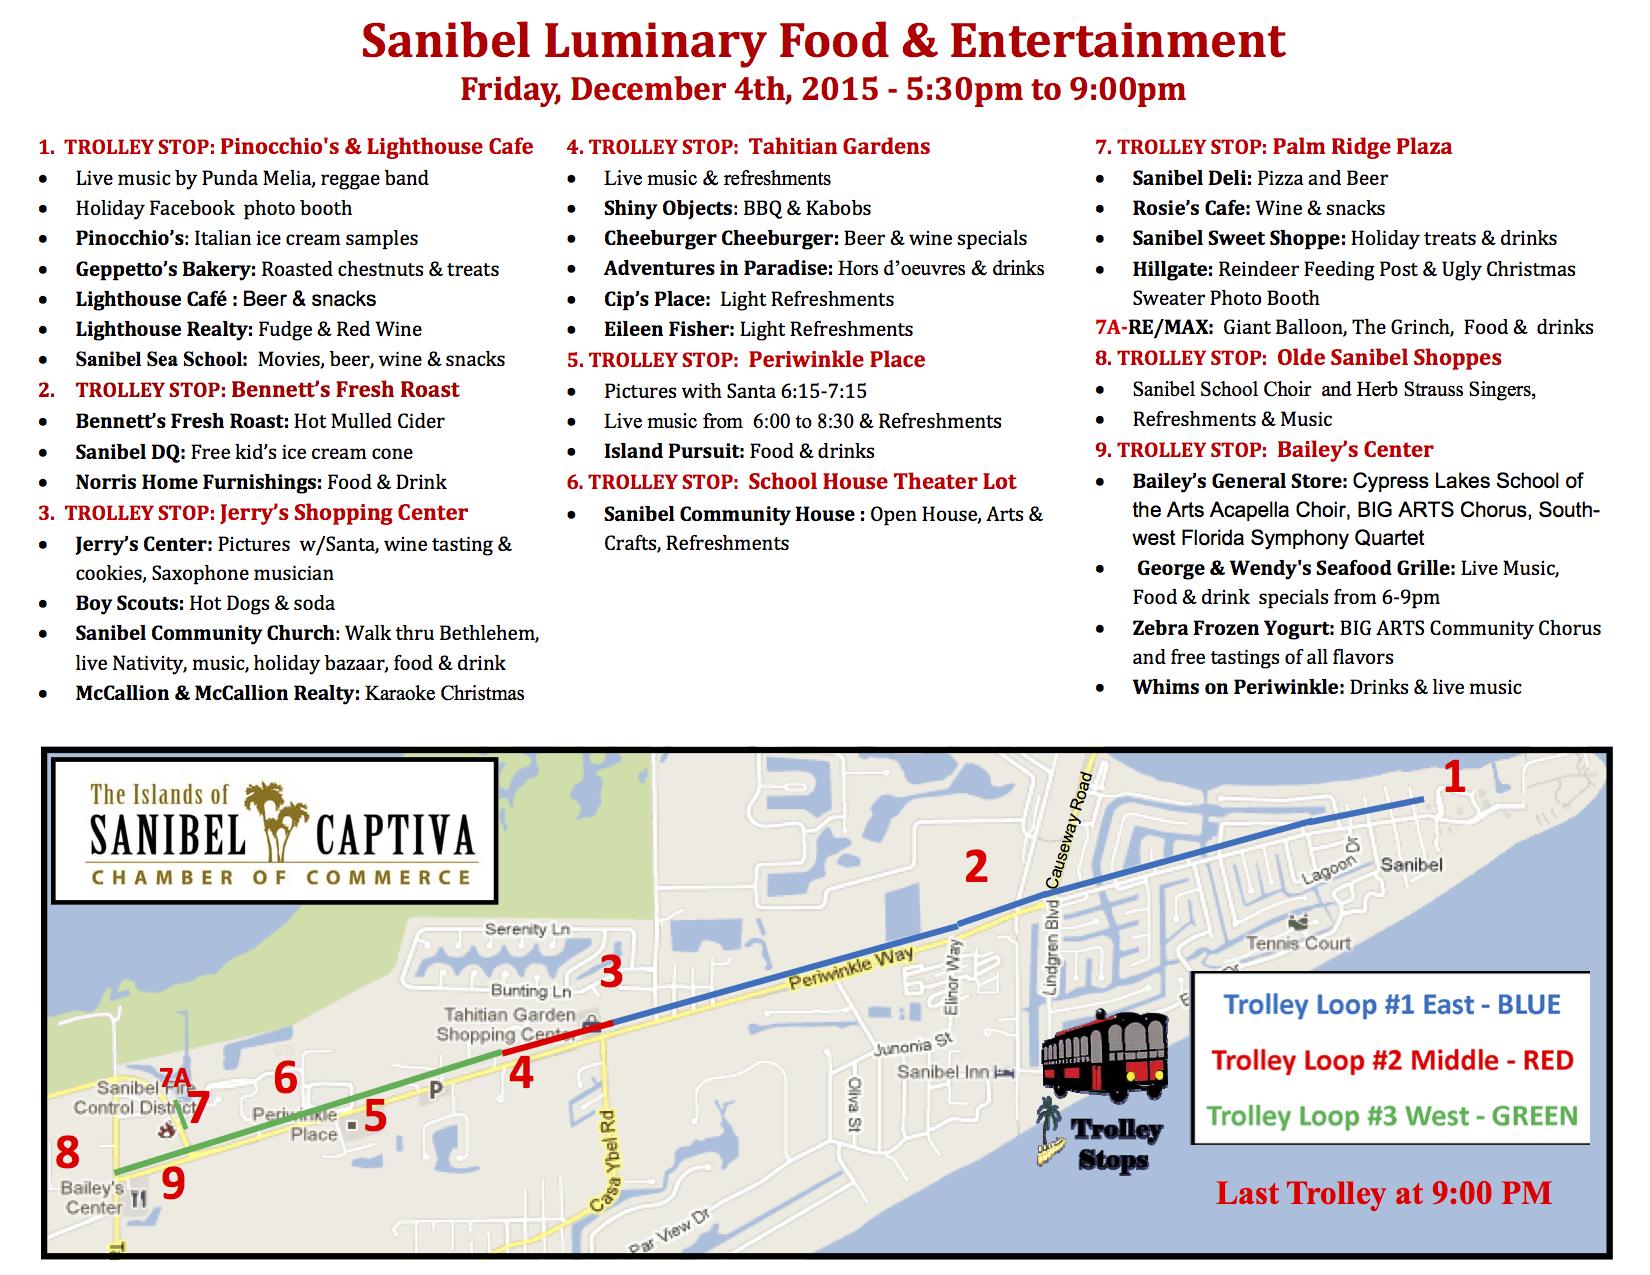 SanibelLuminaryTrailMap